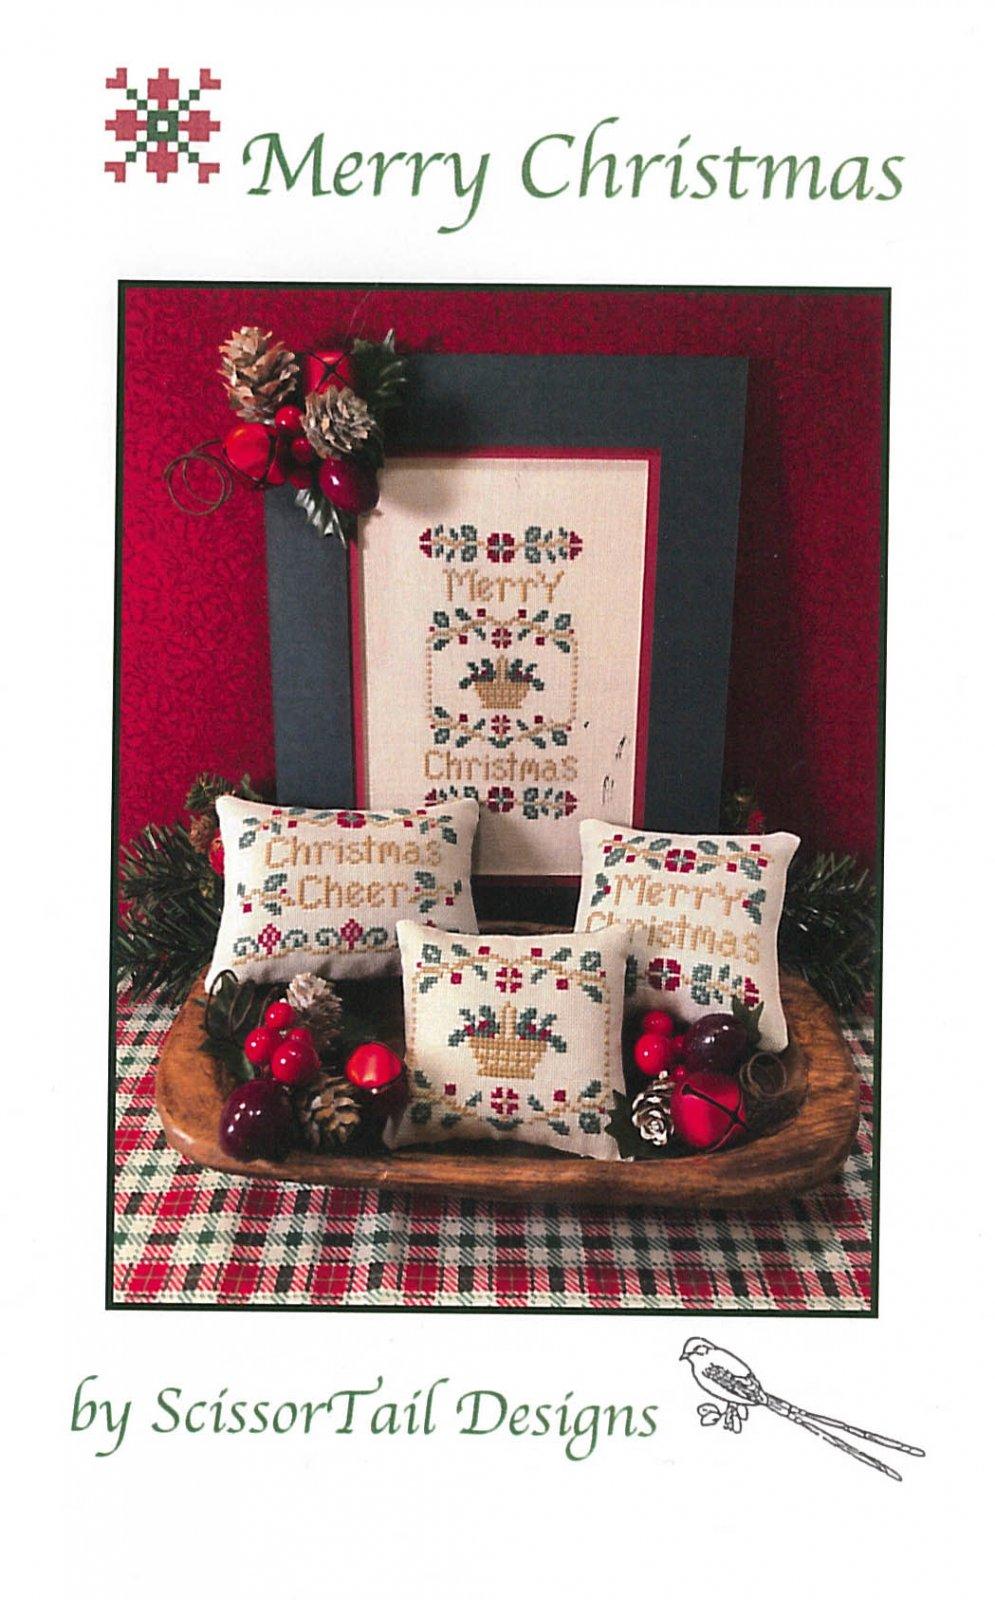 ScissorTail Designs - Merry Christmas